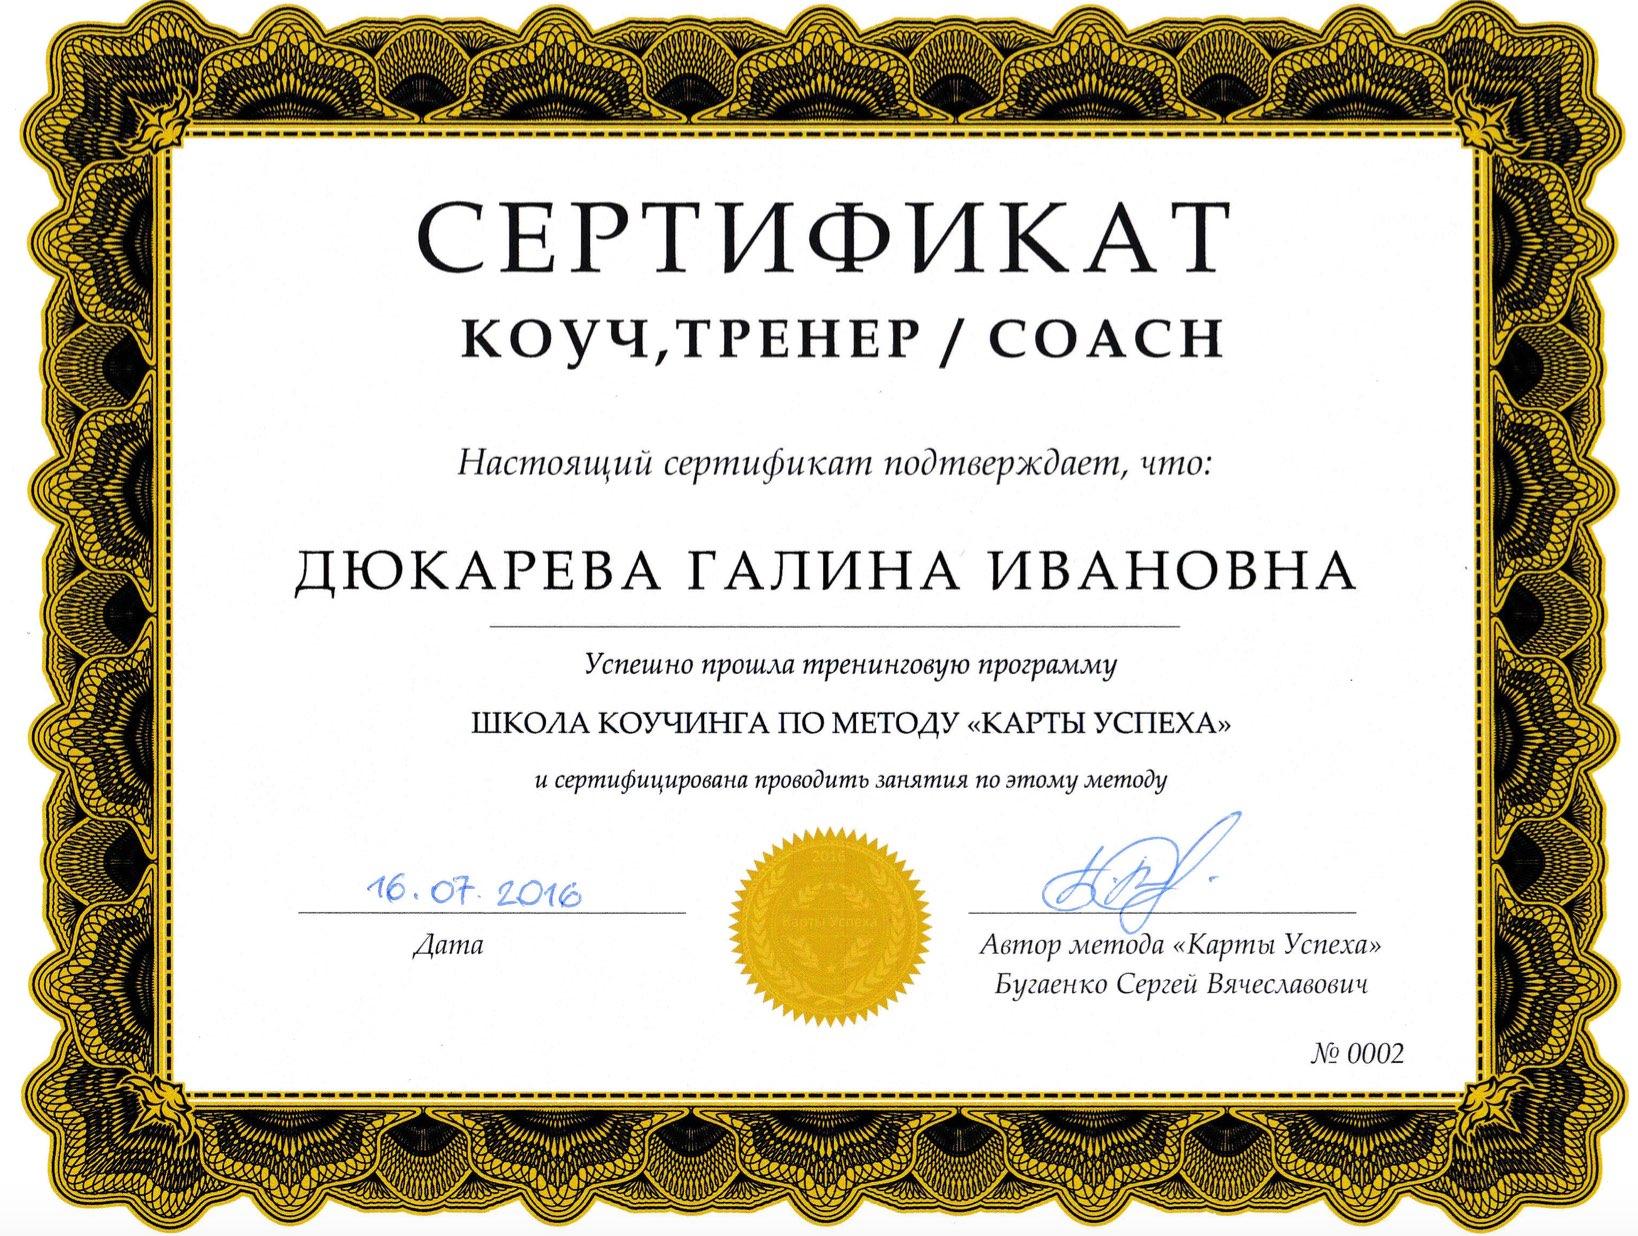 дюкарева сертификат 1